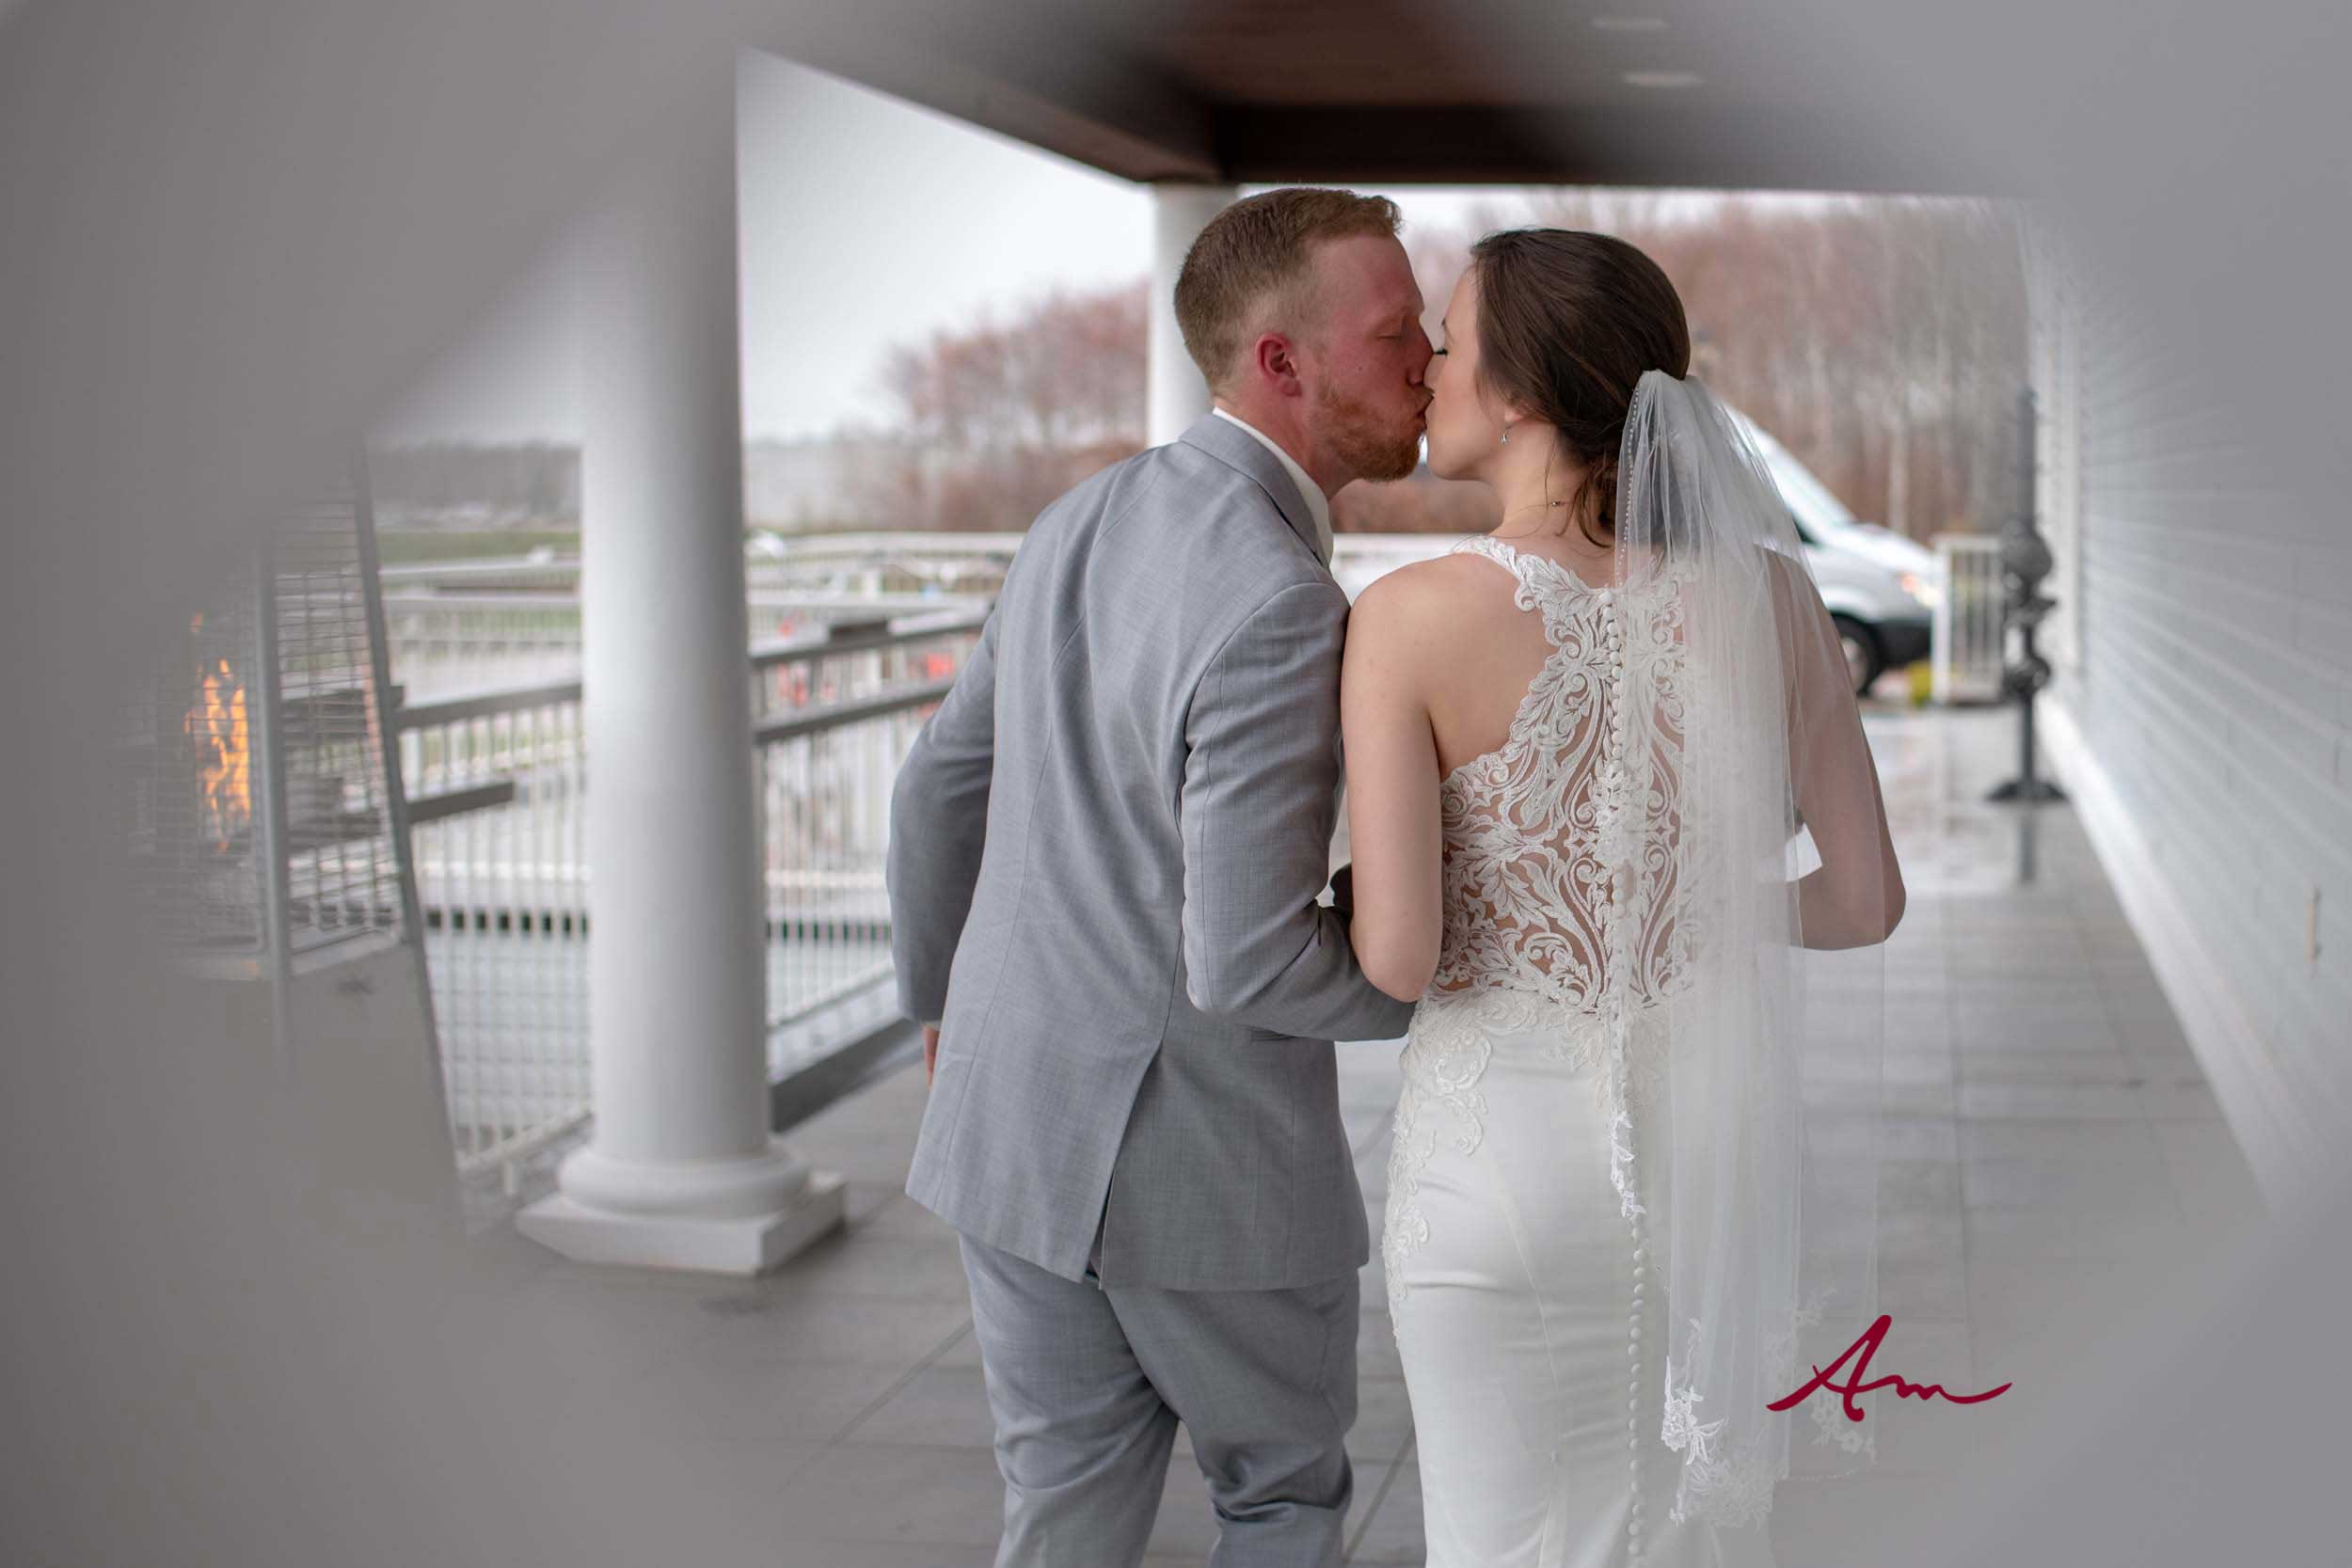 Fox-Harb'r-Wedding-Post-Ceremony-Kiss.jpg